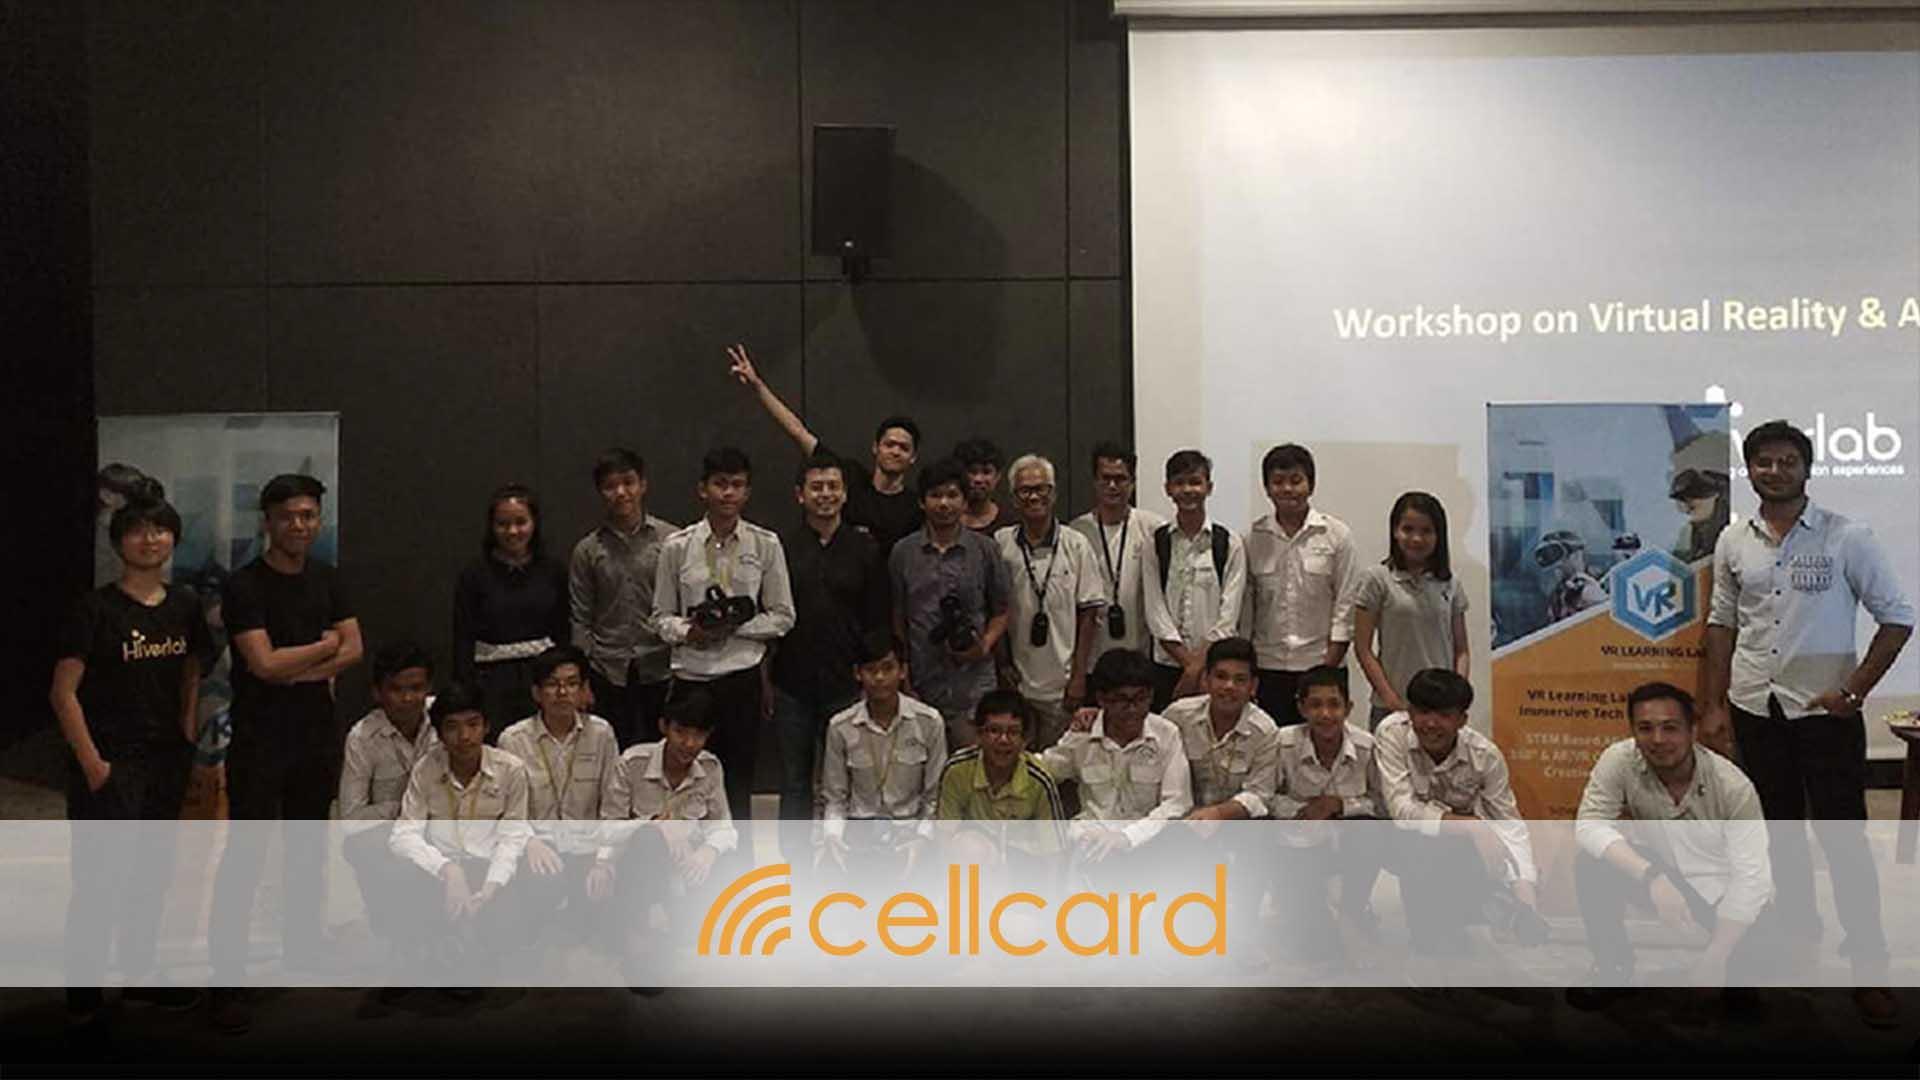 AR VR Workshop for Cellcard